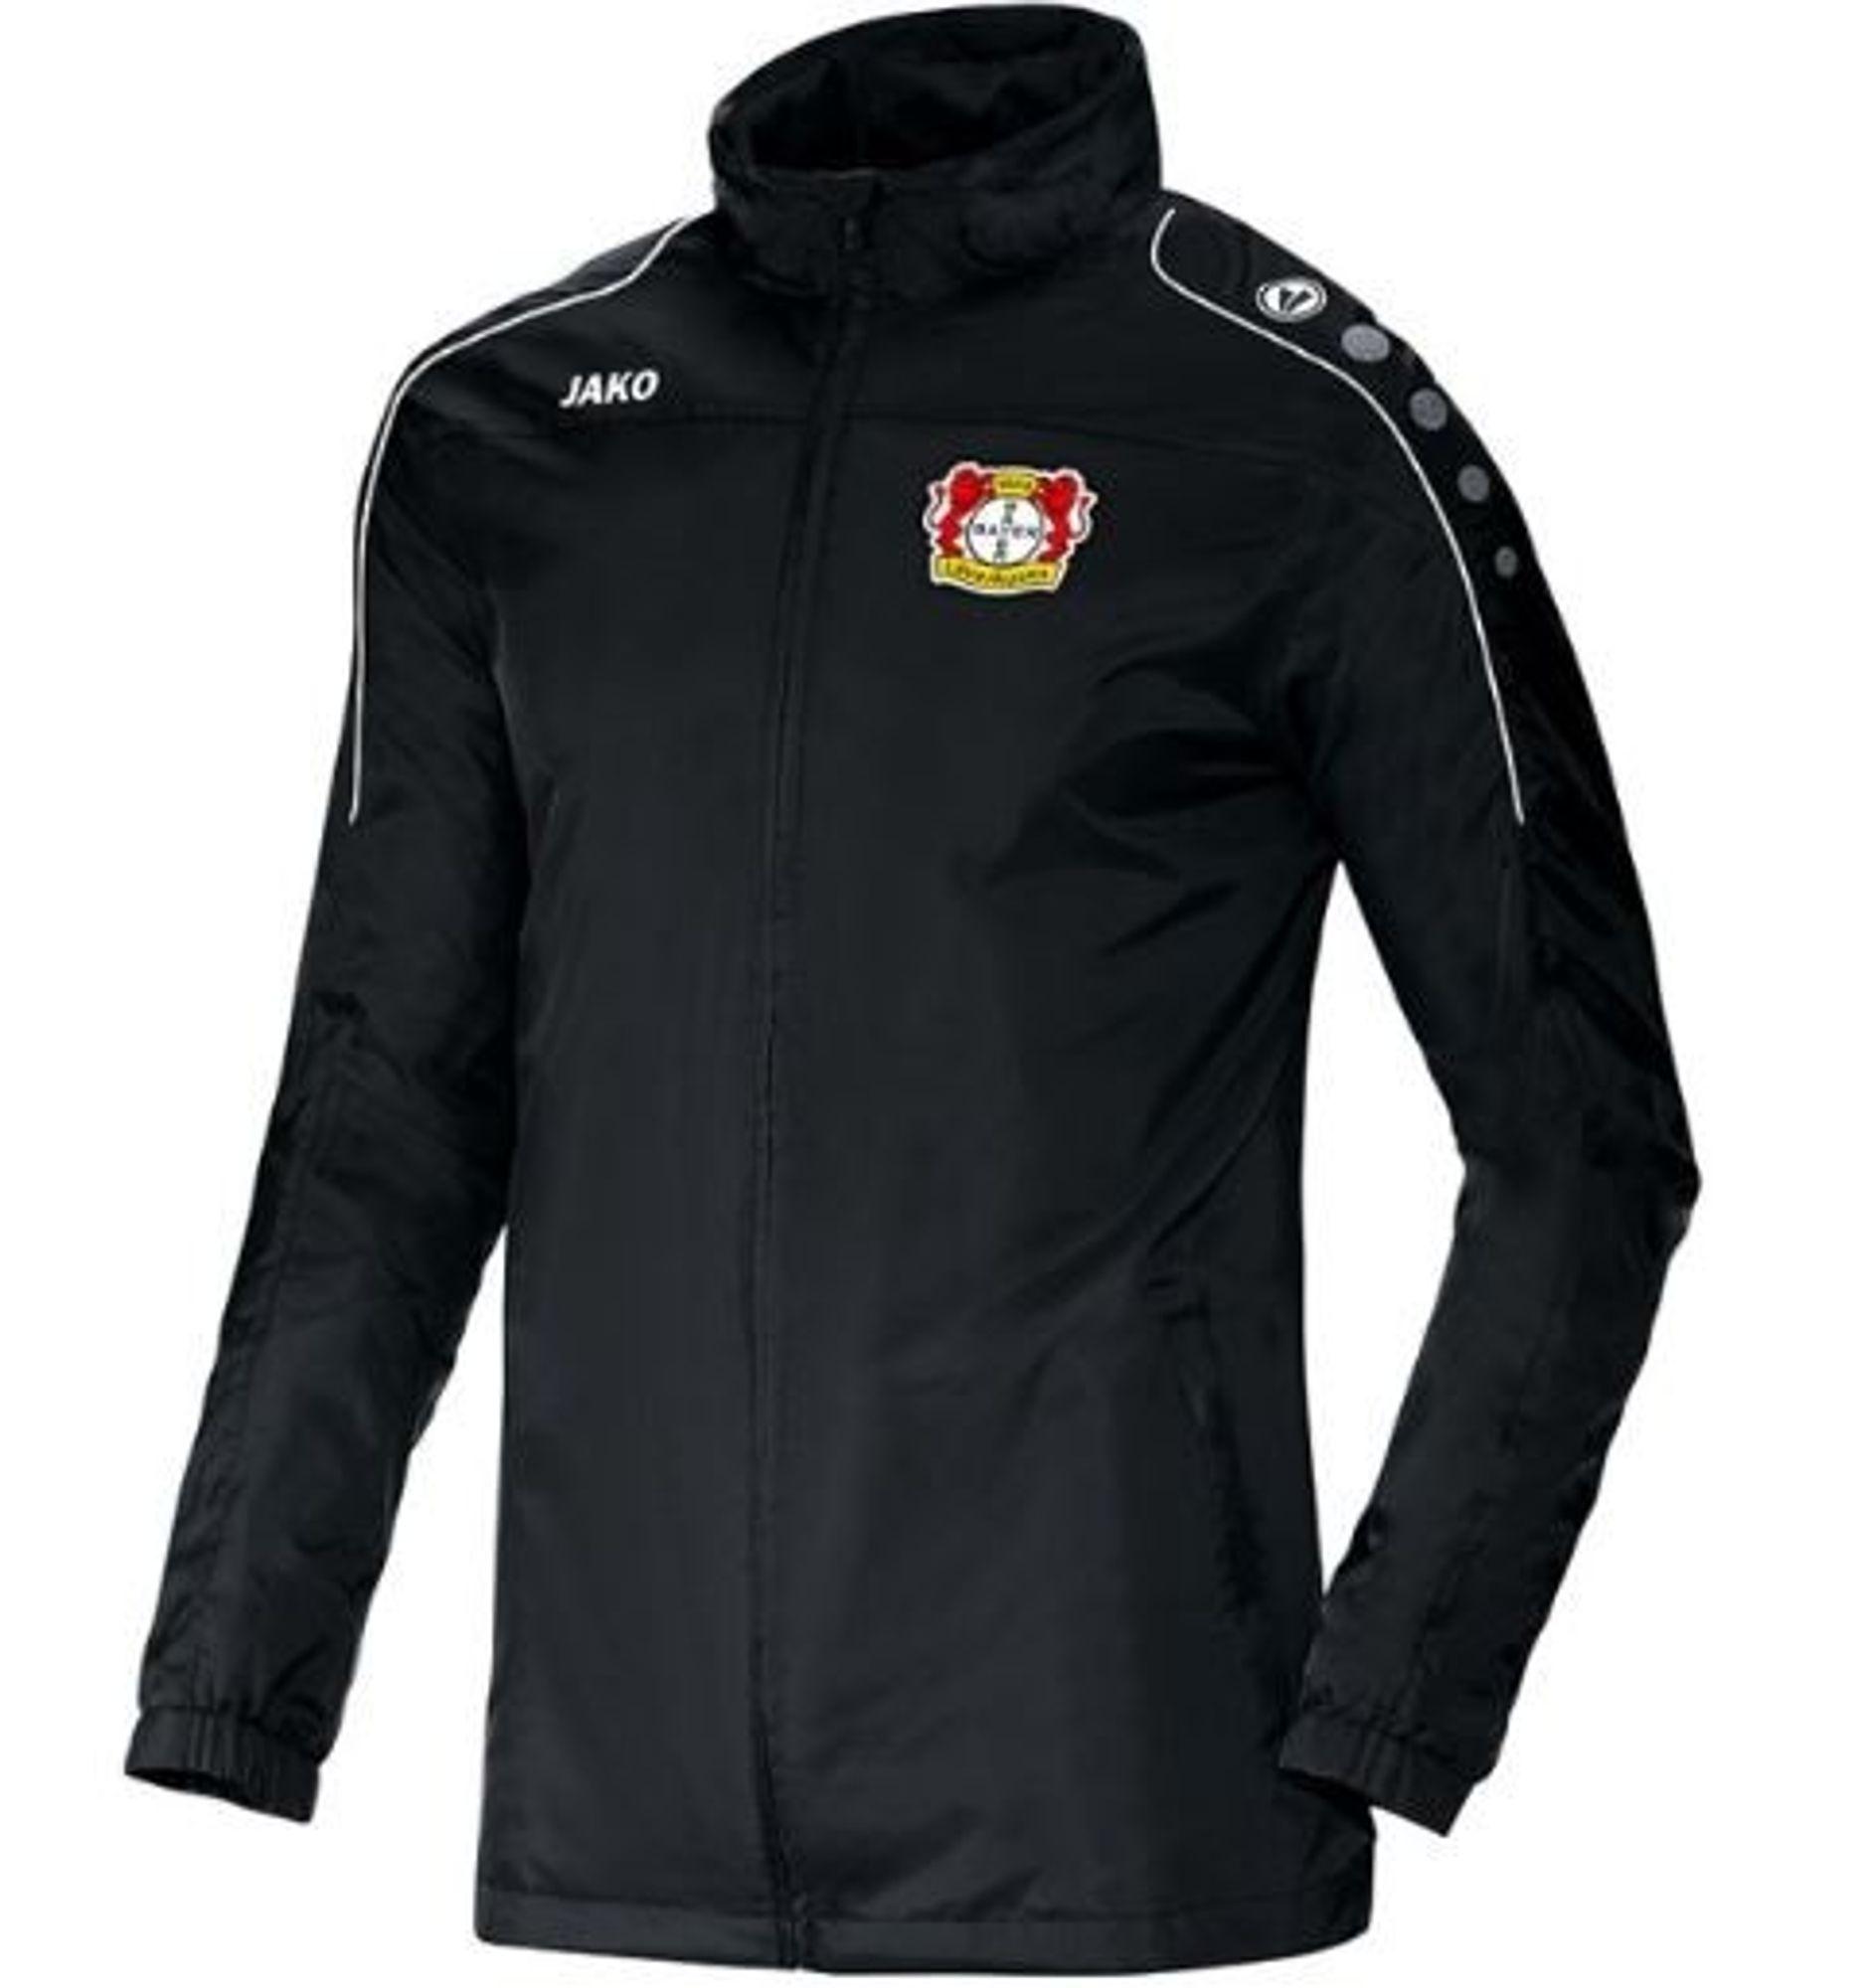 Jako Bayer 04 Leverkusen Allwetterjacke Team - schwarz